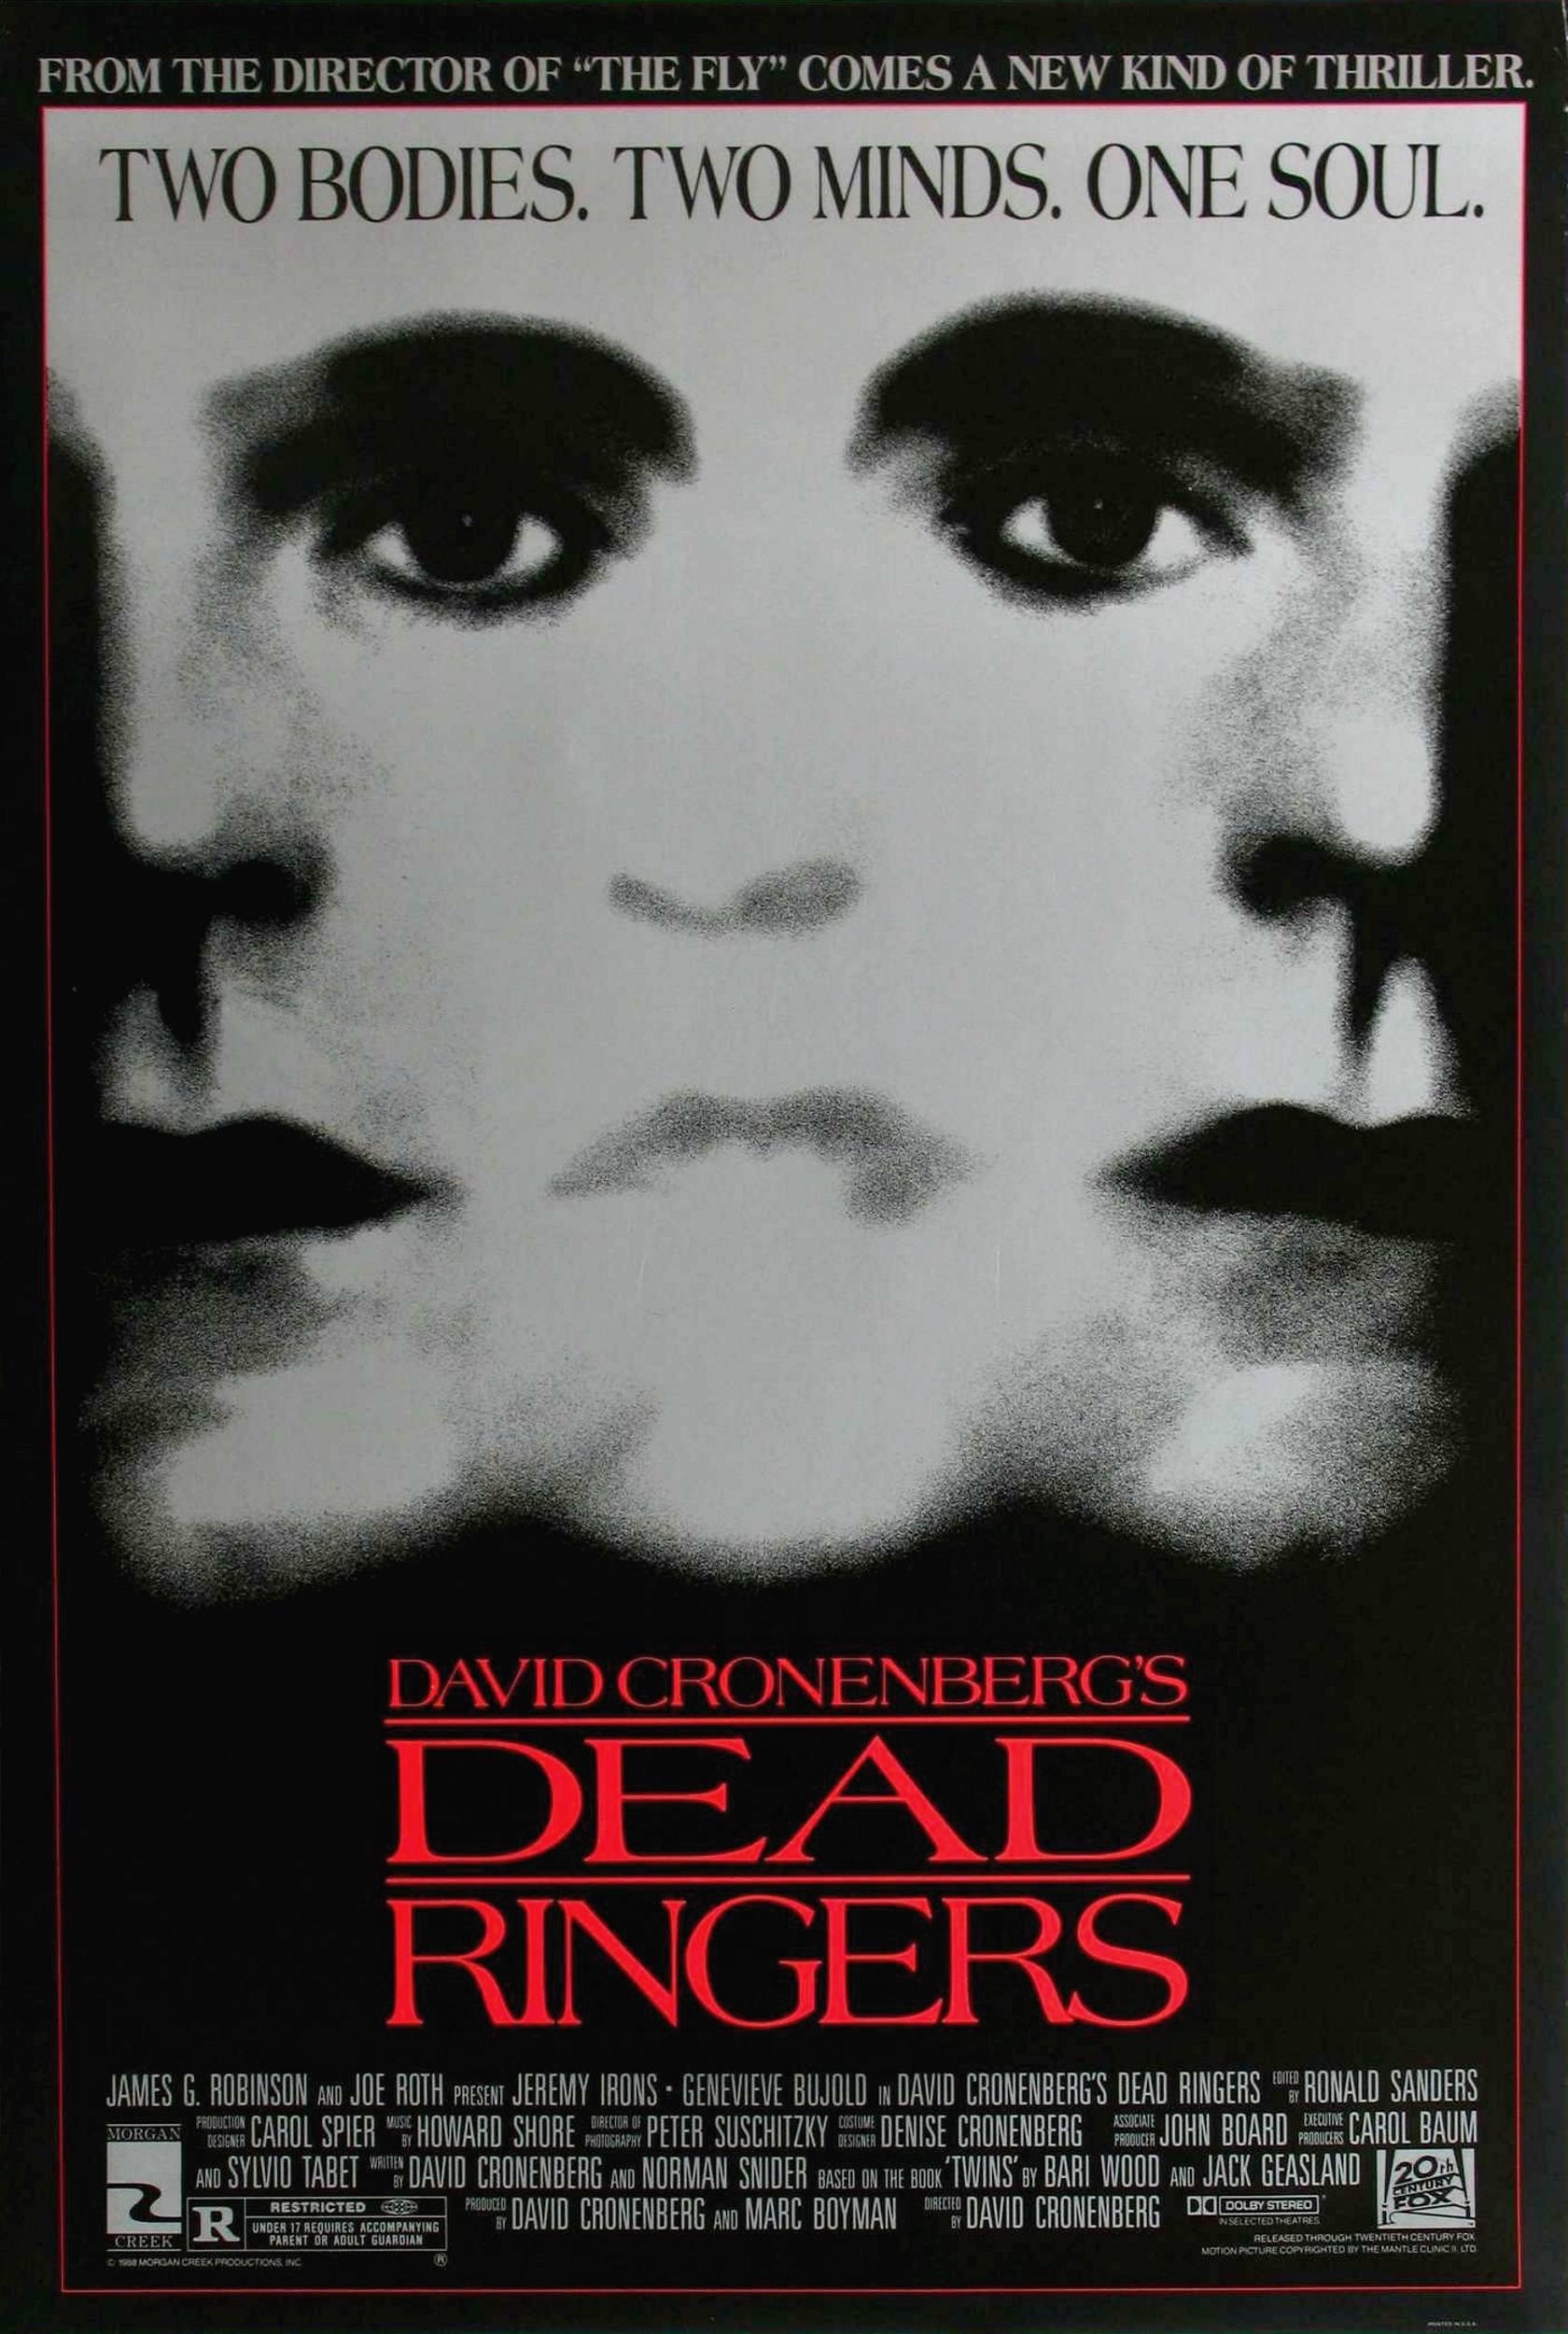 http://en.academic.ru/pictures/enwiki/68/Dead_ringers_poster.jpg